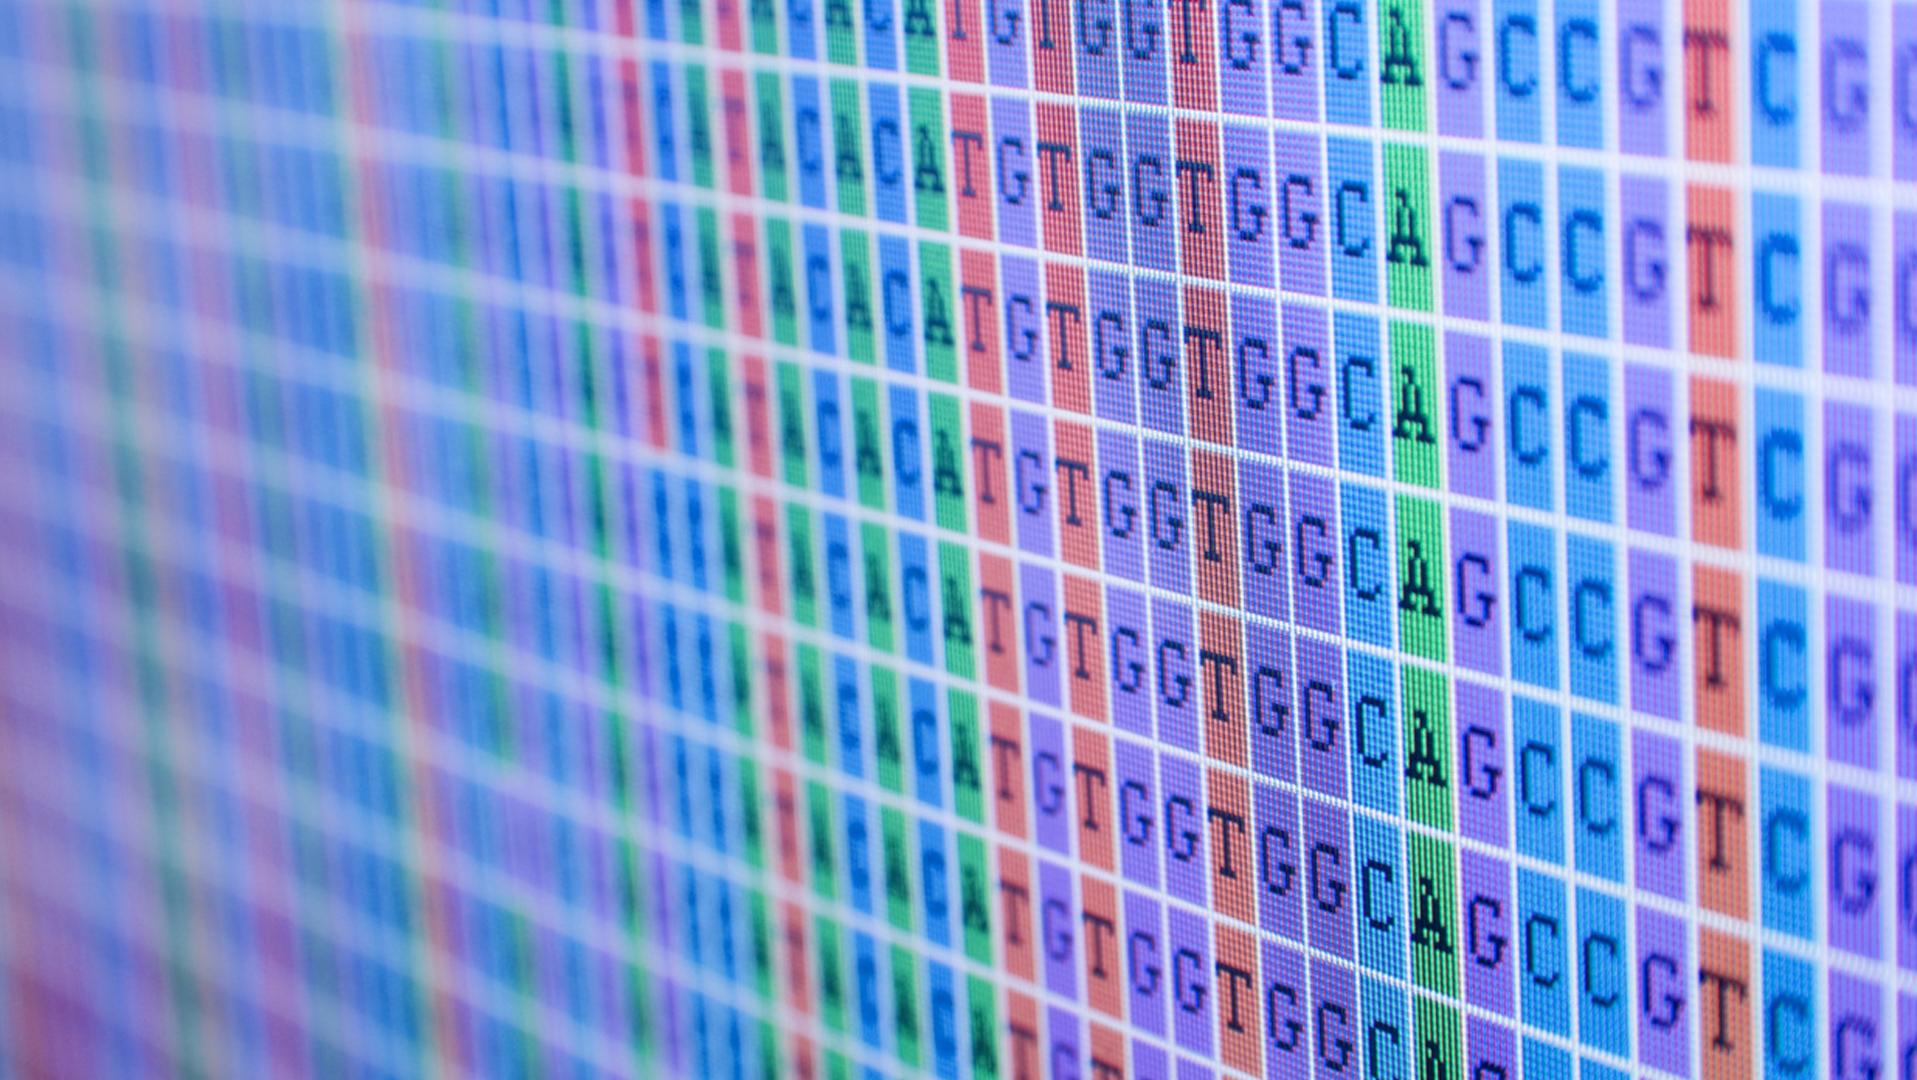 Bioinformatic Methods I